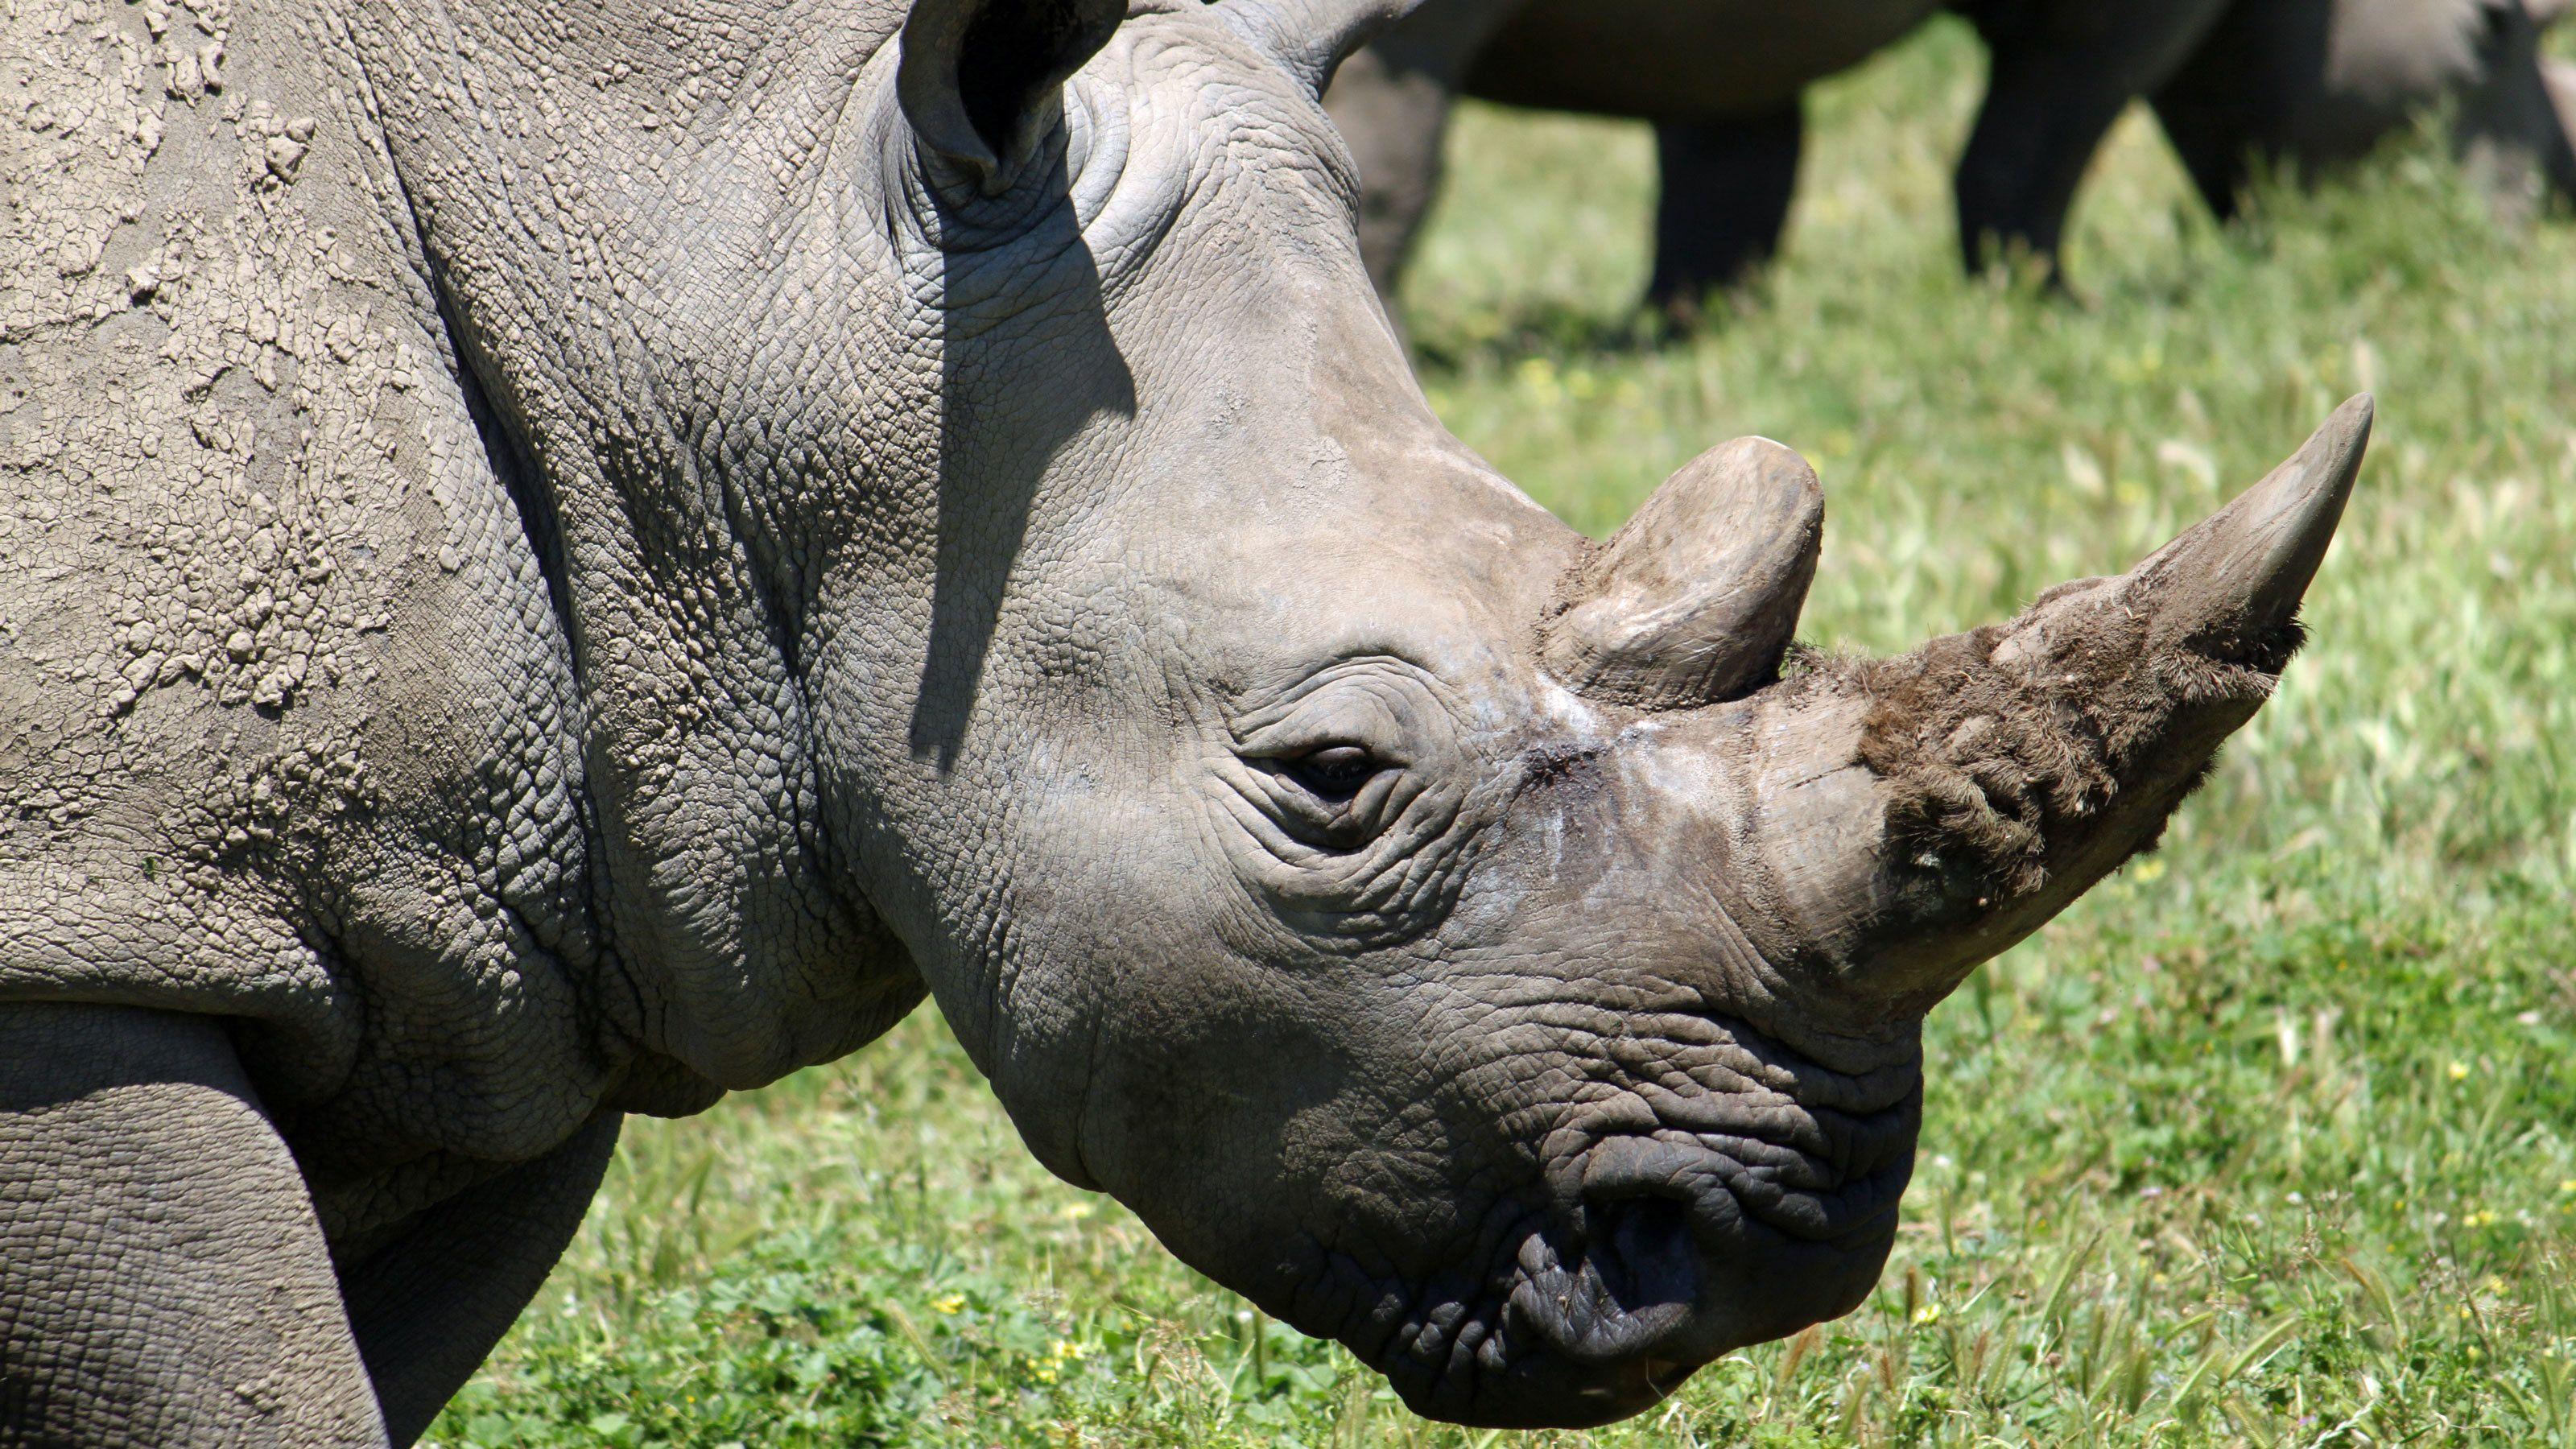 Rhinoceros at the Werribee Open Range Zoo in Australia